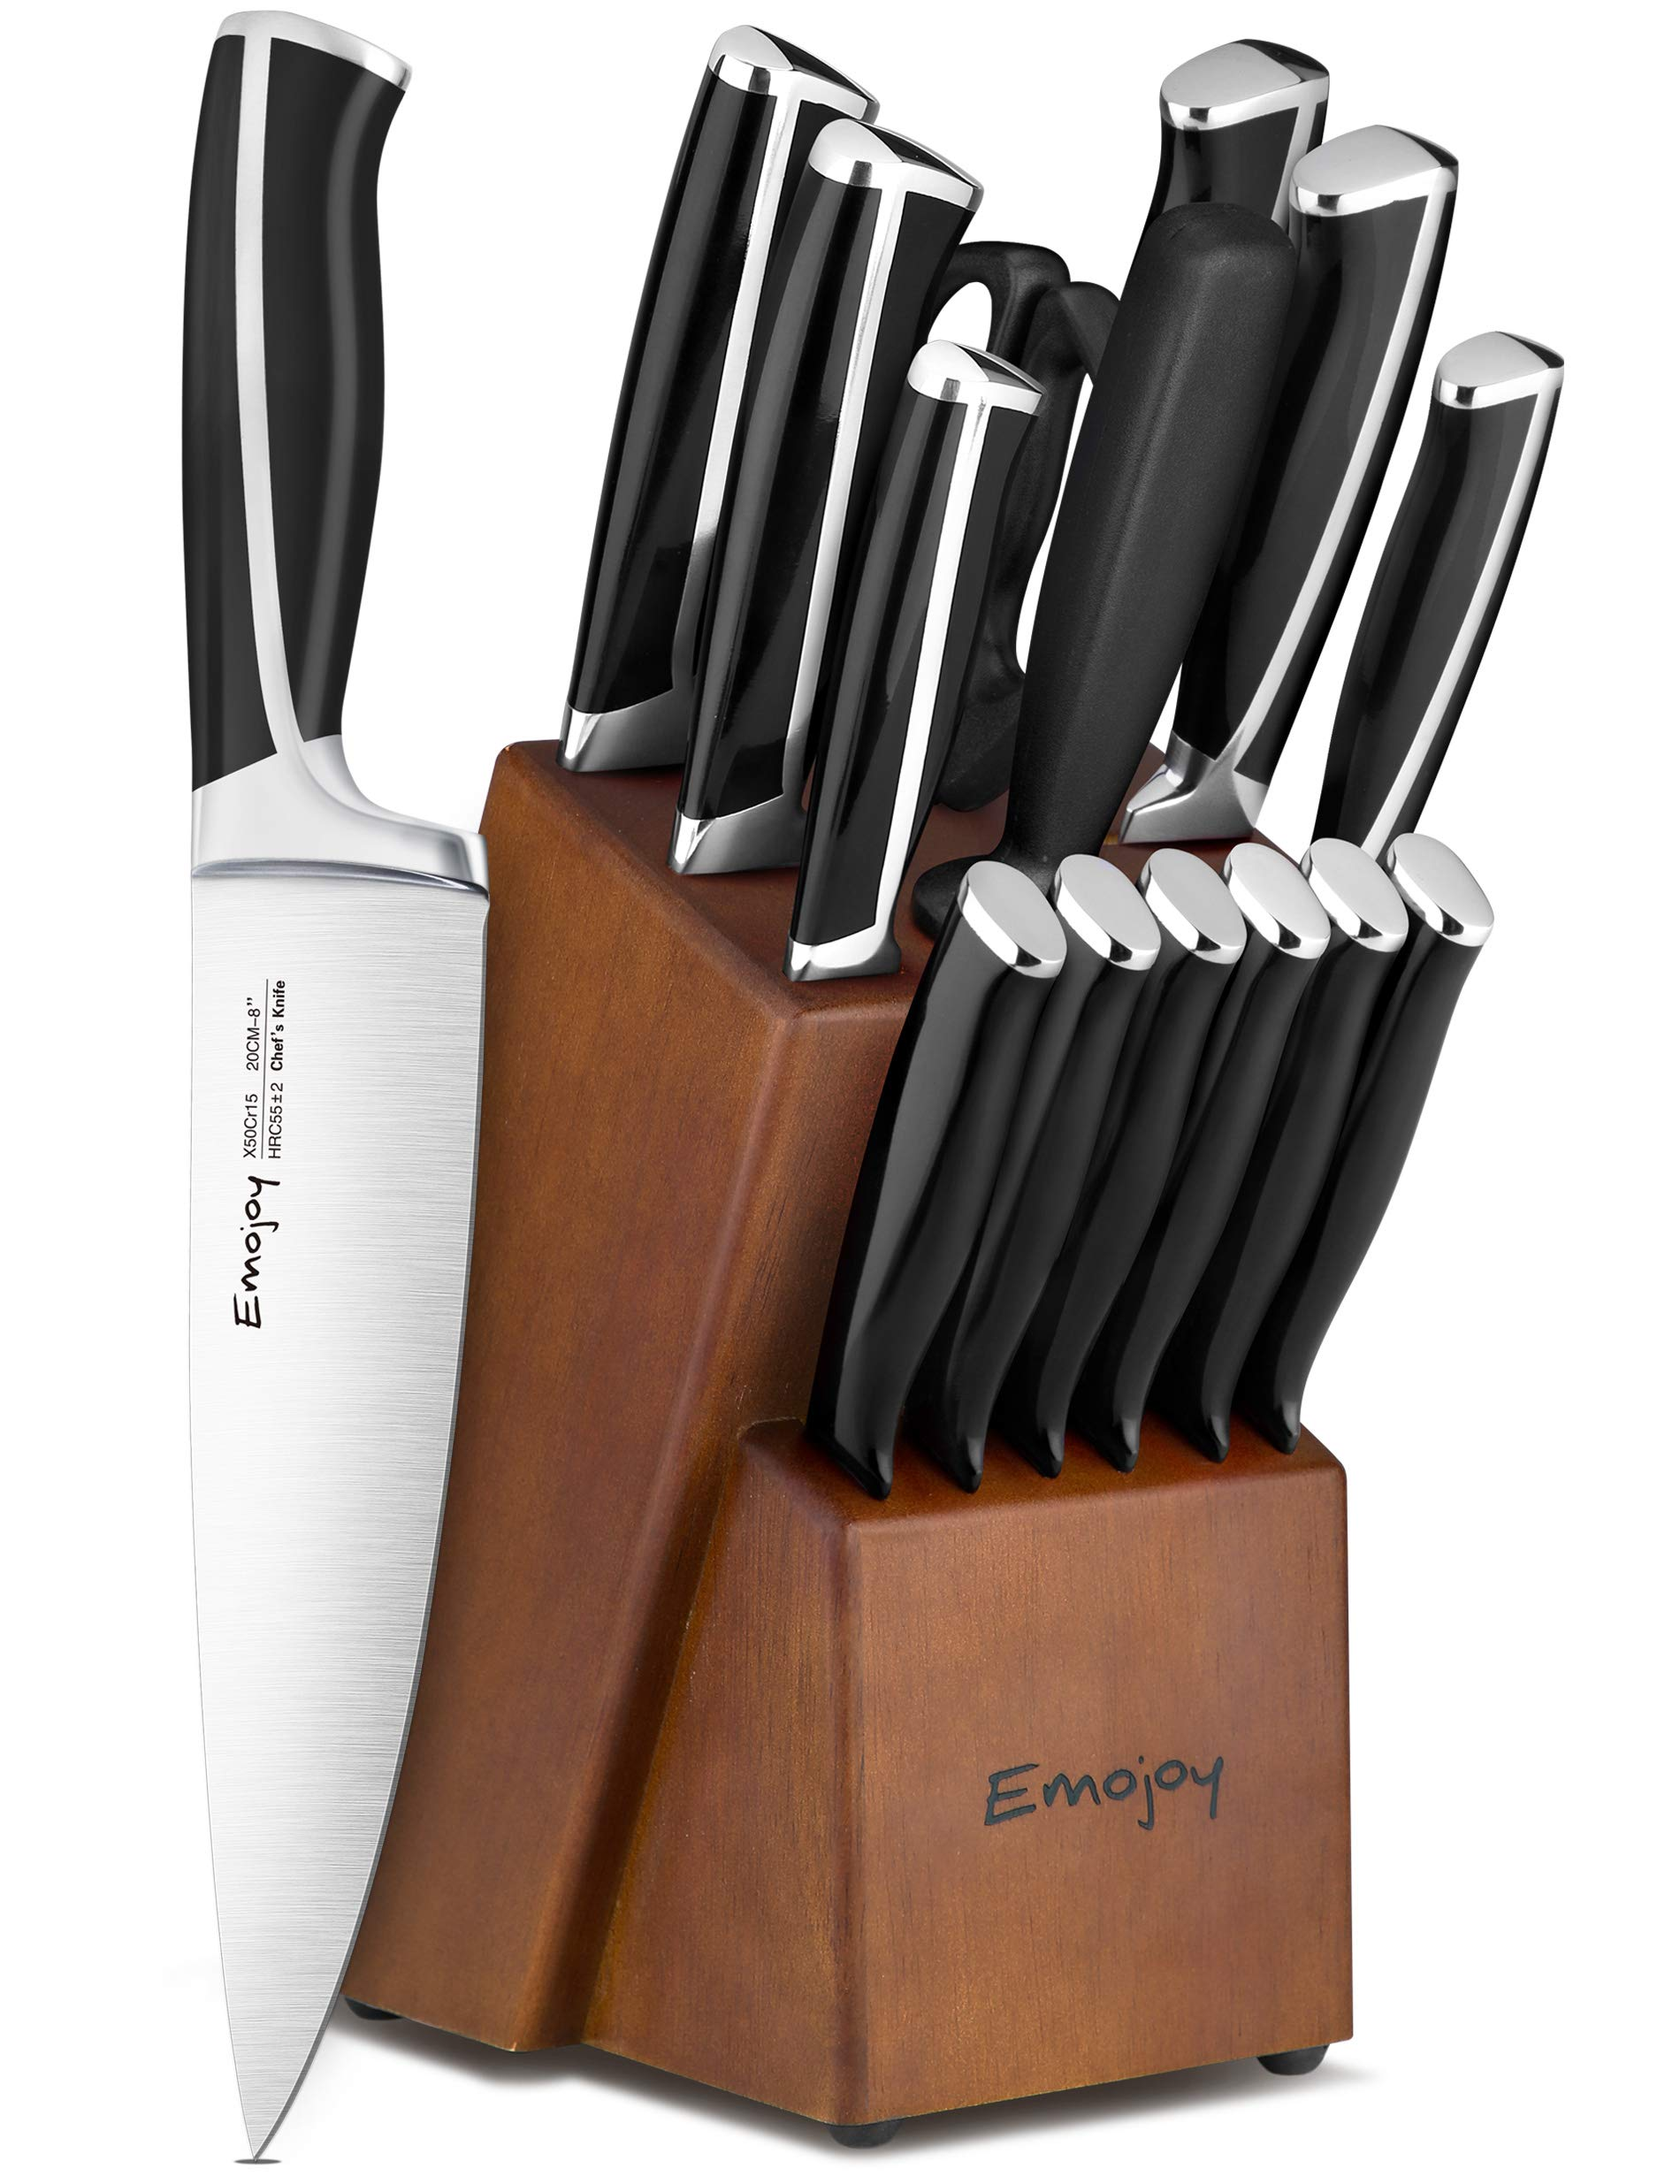 Emojoy Knife Set, 15-Piece Kitchen Knife Set with Block, ABS Handle for Chef Knife Set, German Stainless Steel, by Emojoy (Black) by Emojoy  (Image #1)